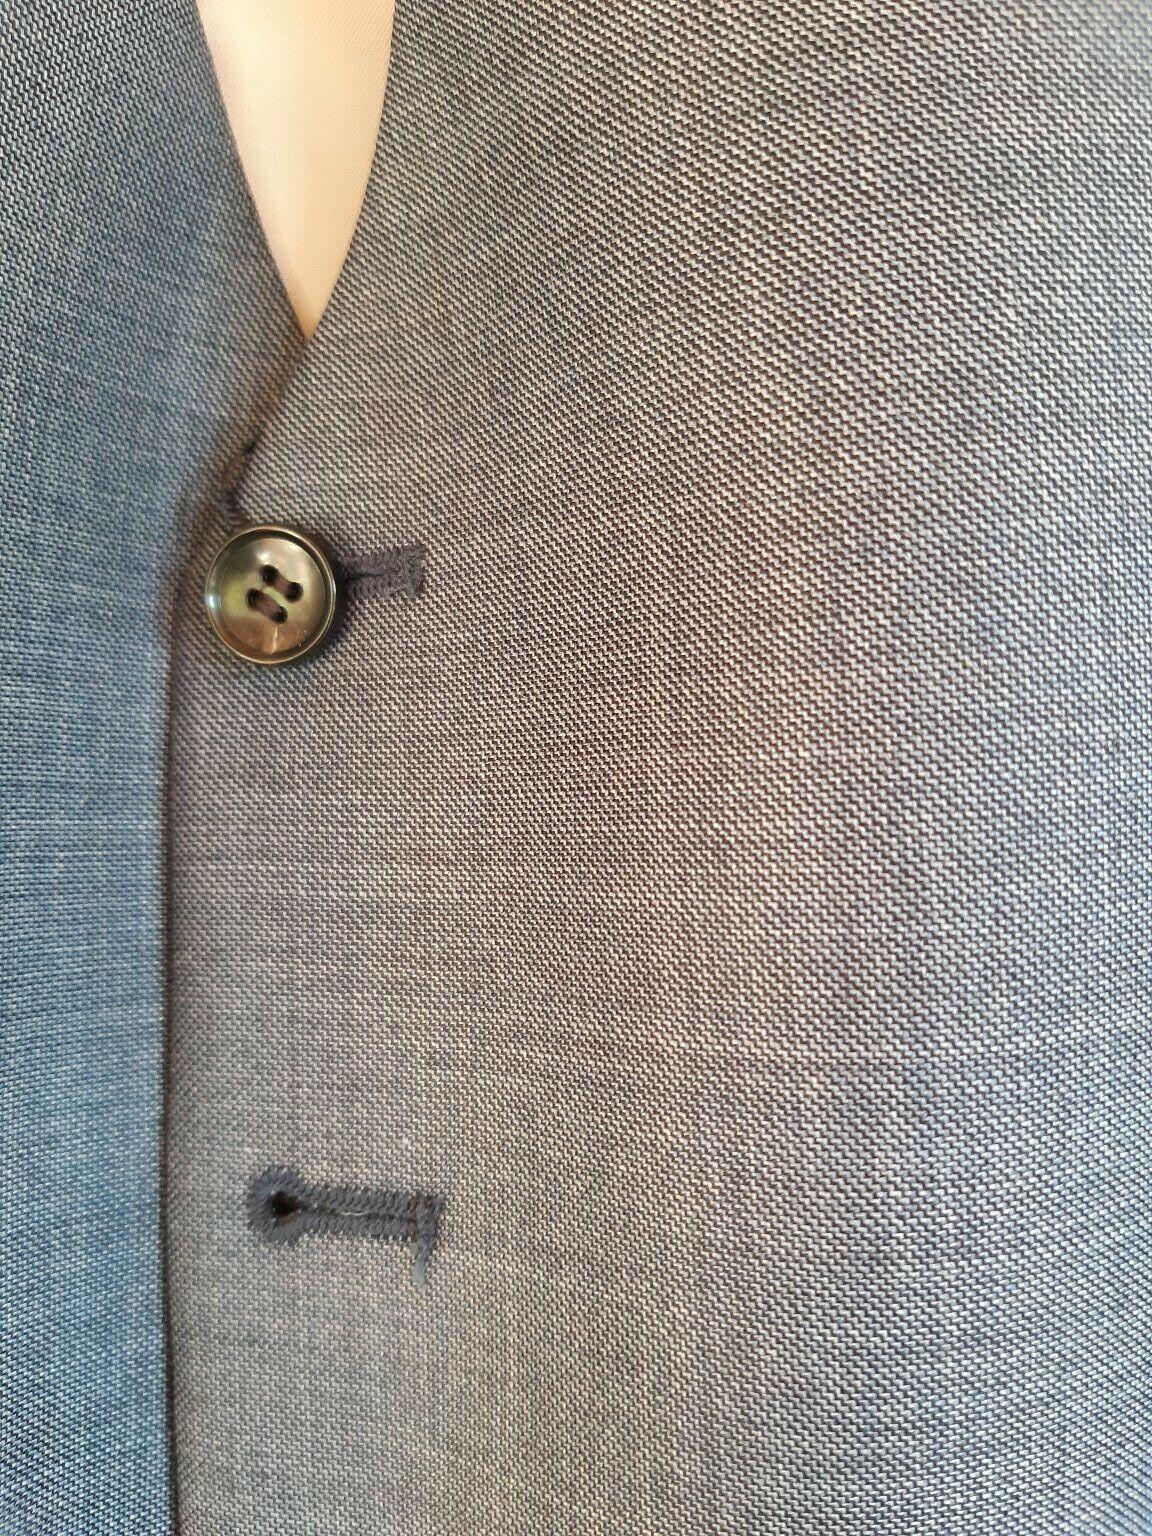 Men's Sharkskin Blue Waistcoat - John Lewis